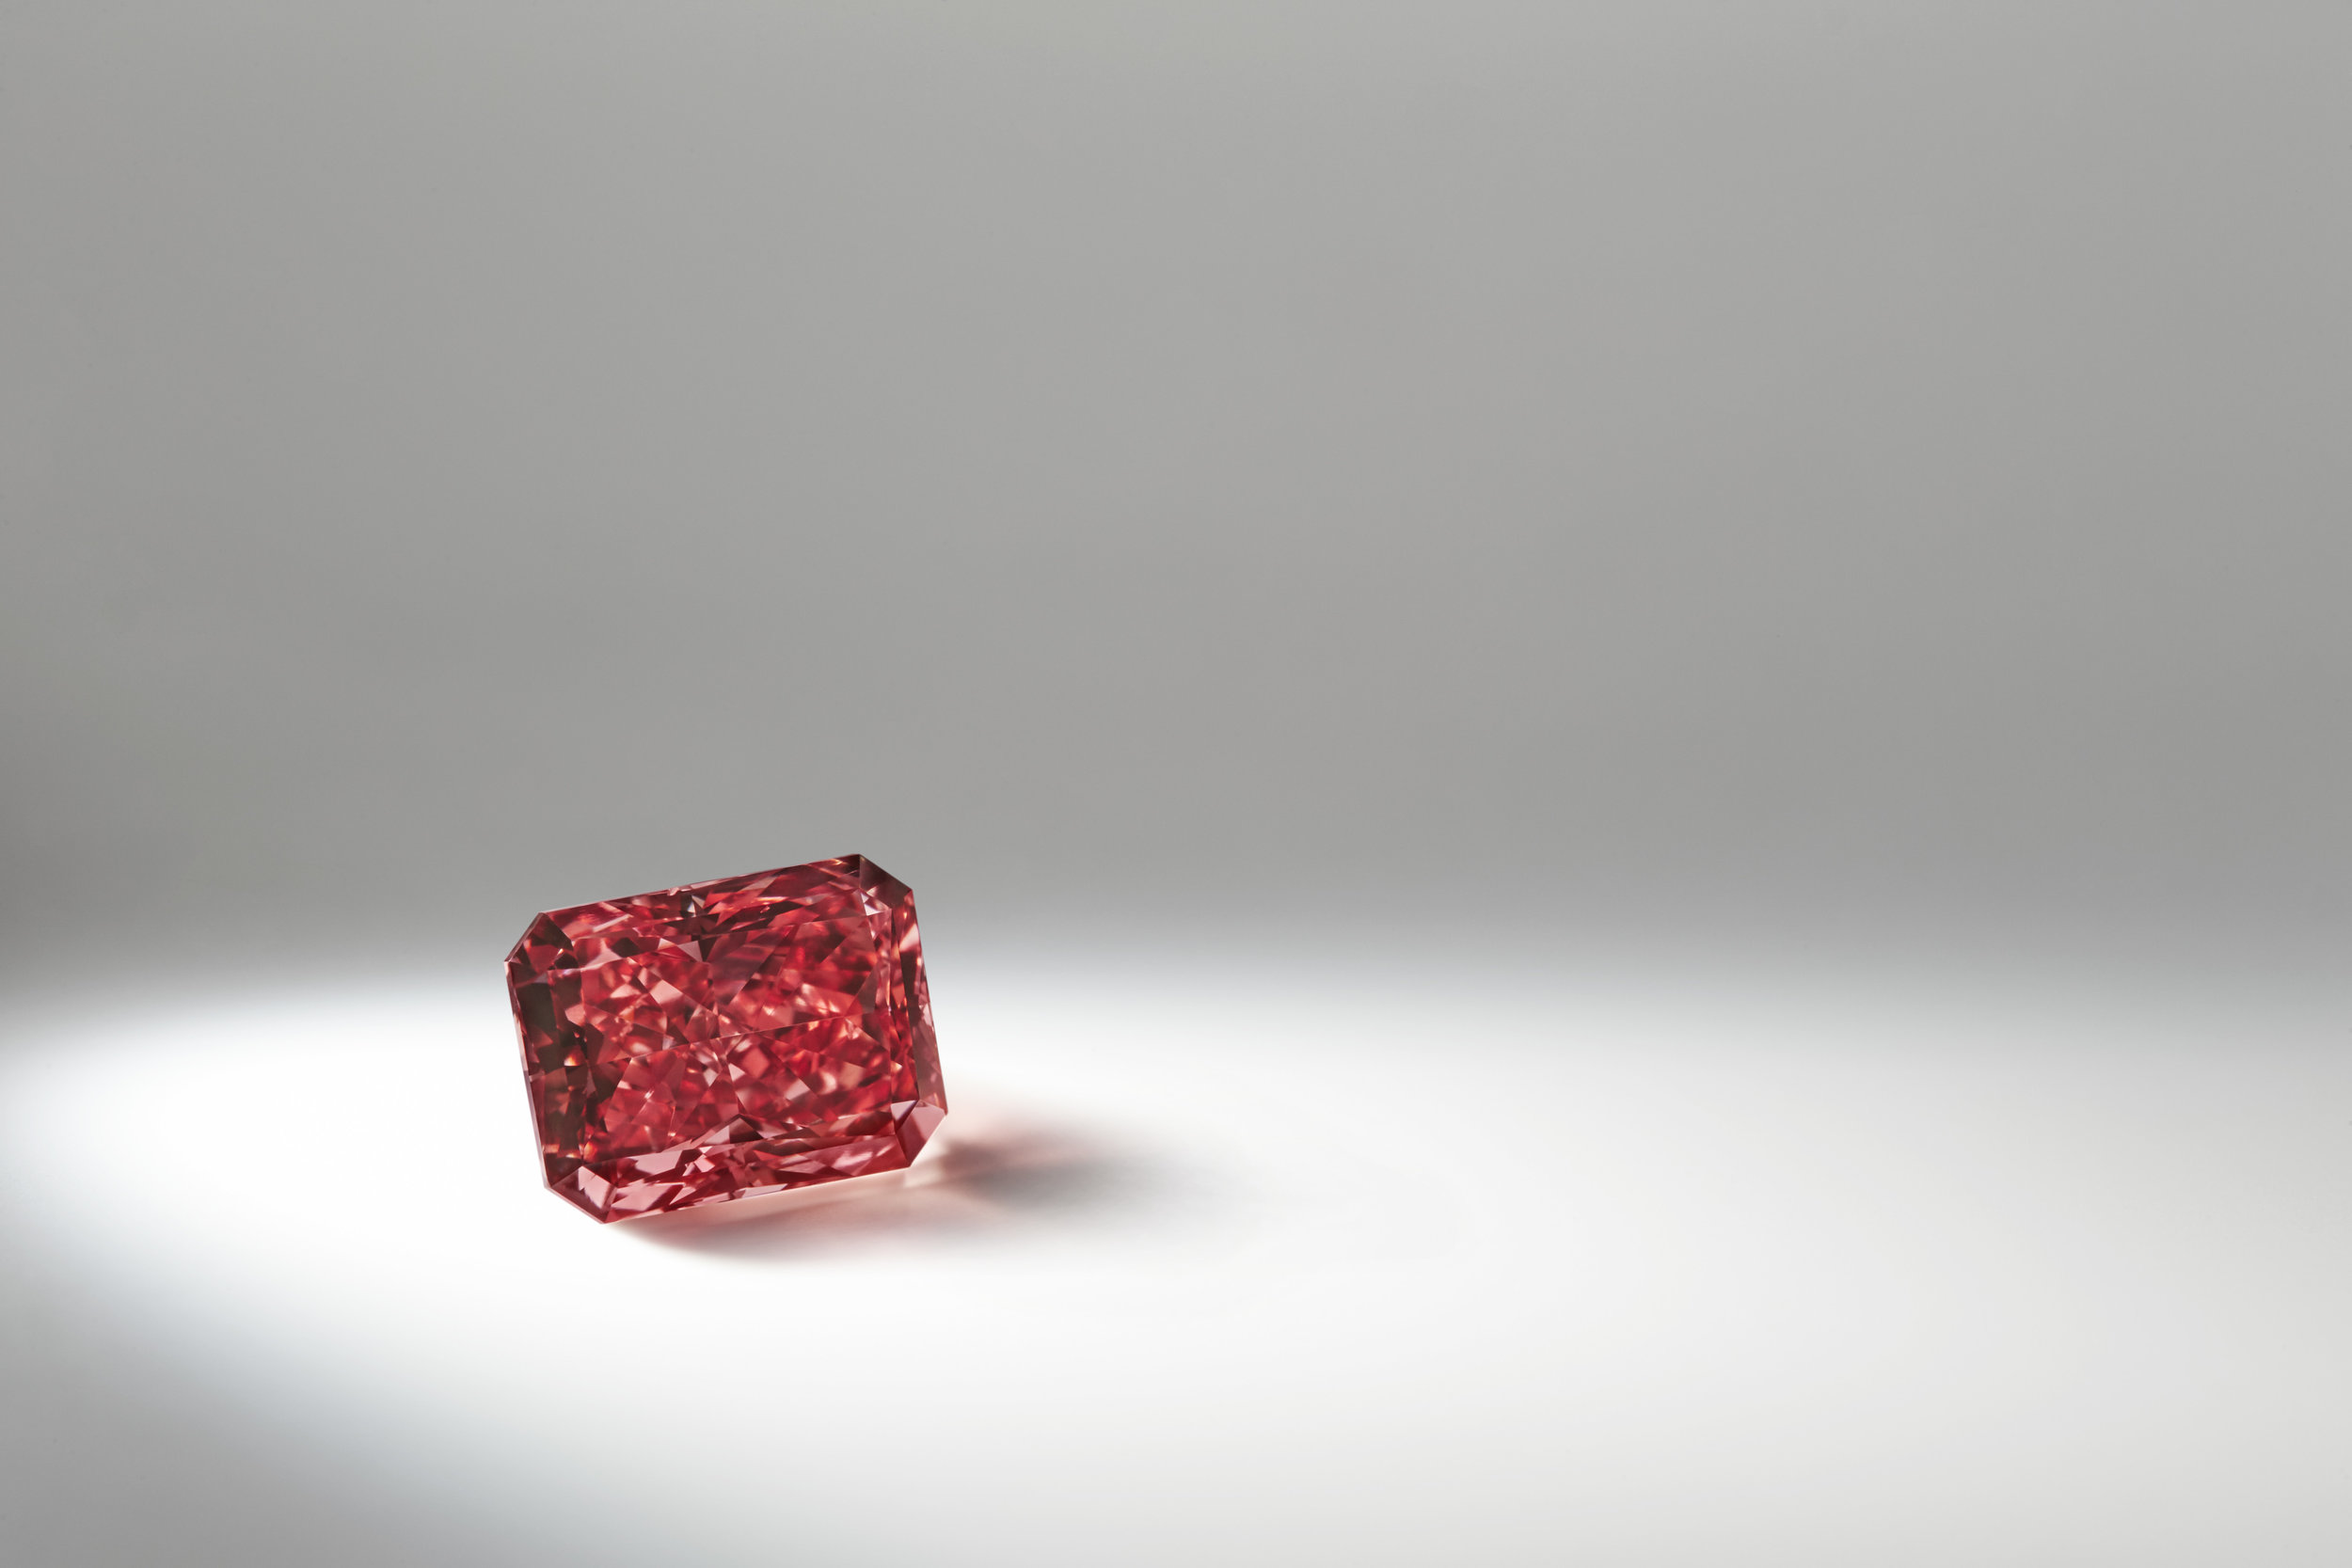 The Argyle Everglow - 2.11 carat polished radiant cut diamond, known as The Argyle Everglow™